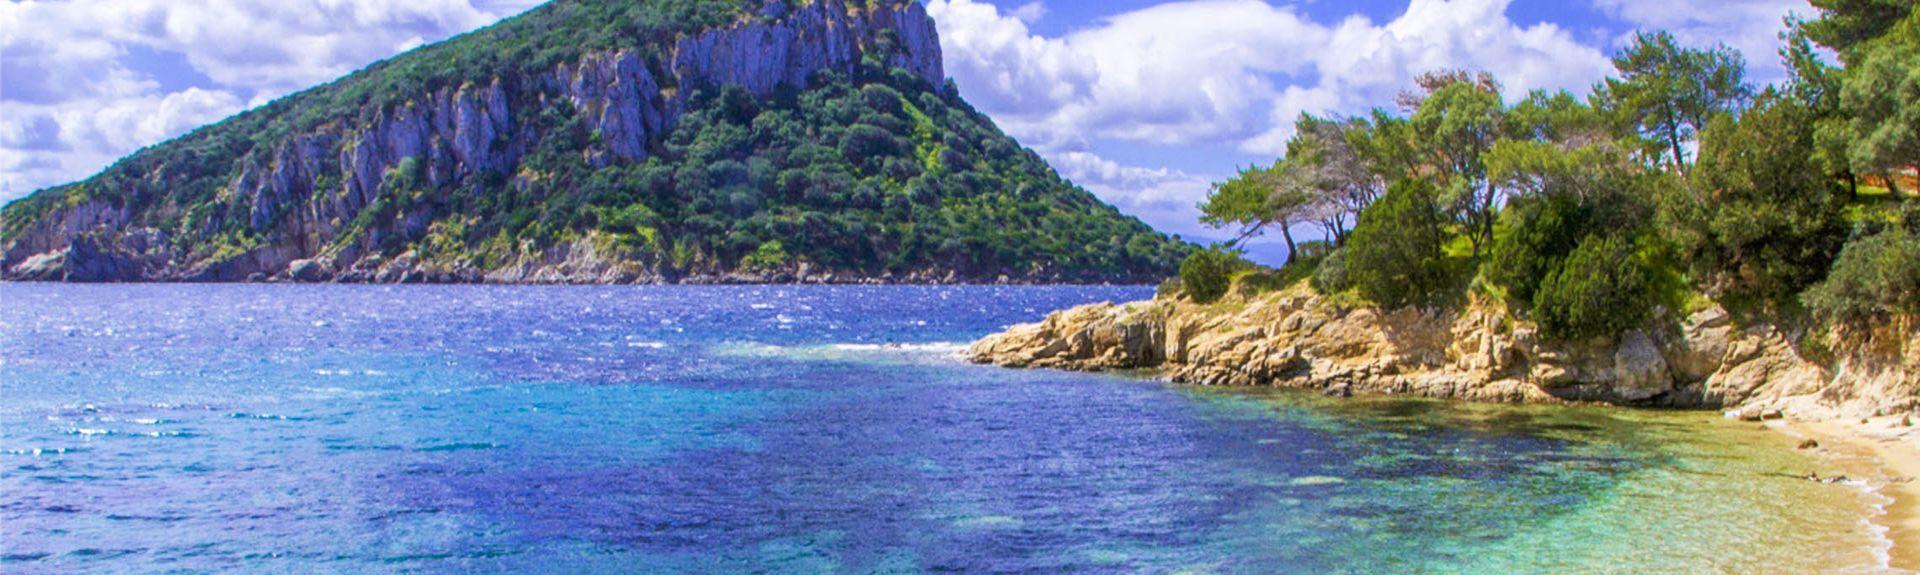 Baia Caddinas, Golfo Aranci, Sardinien, Italien